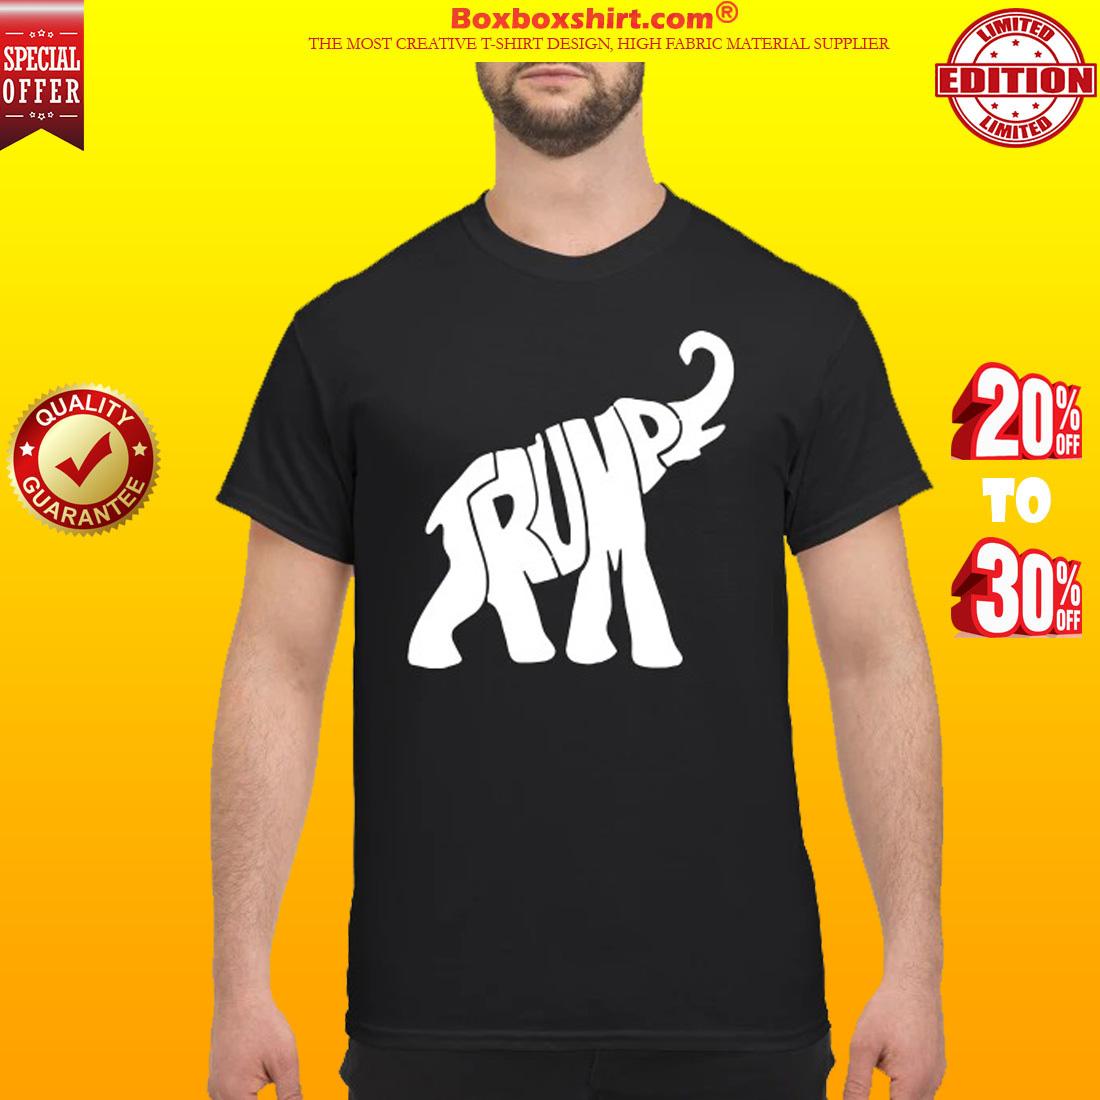 Trump elephant shirt